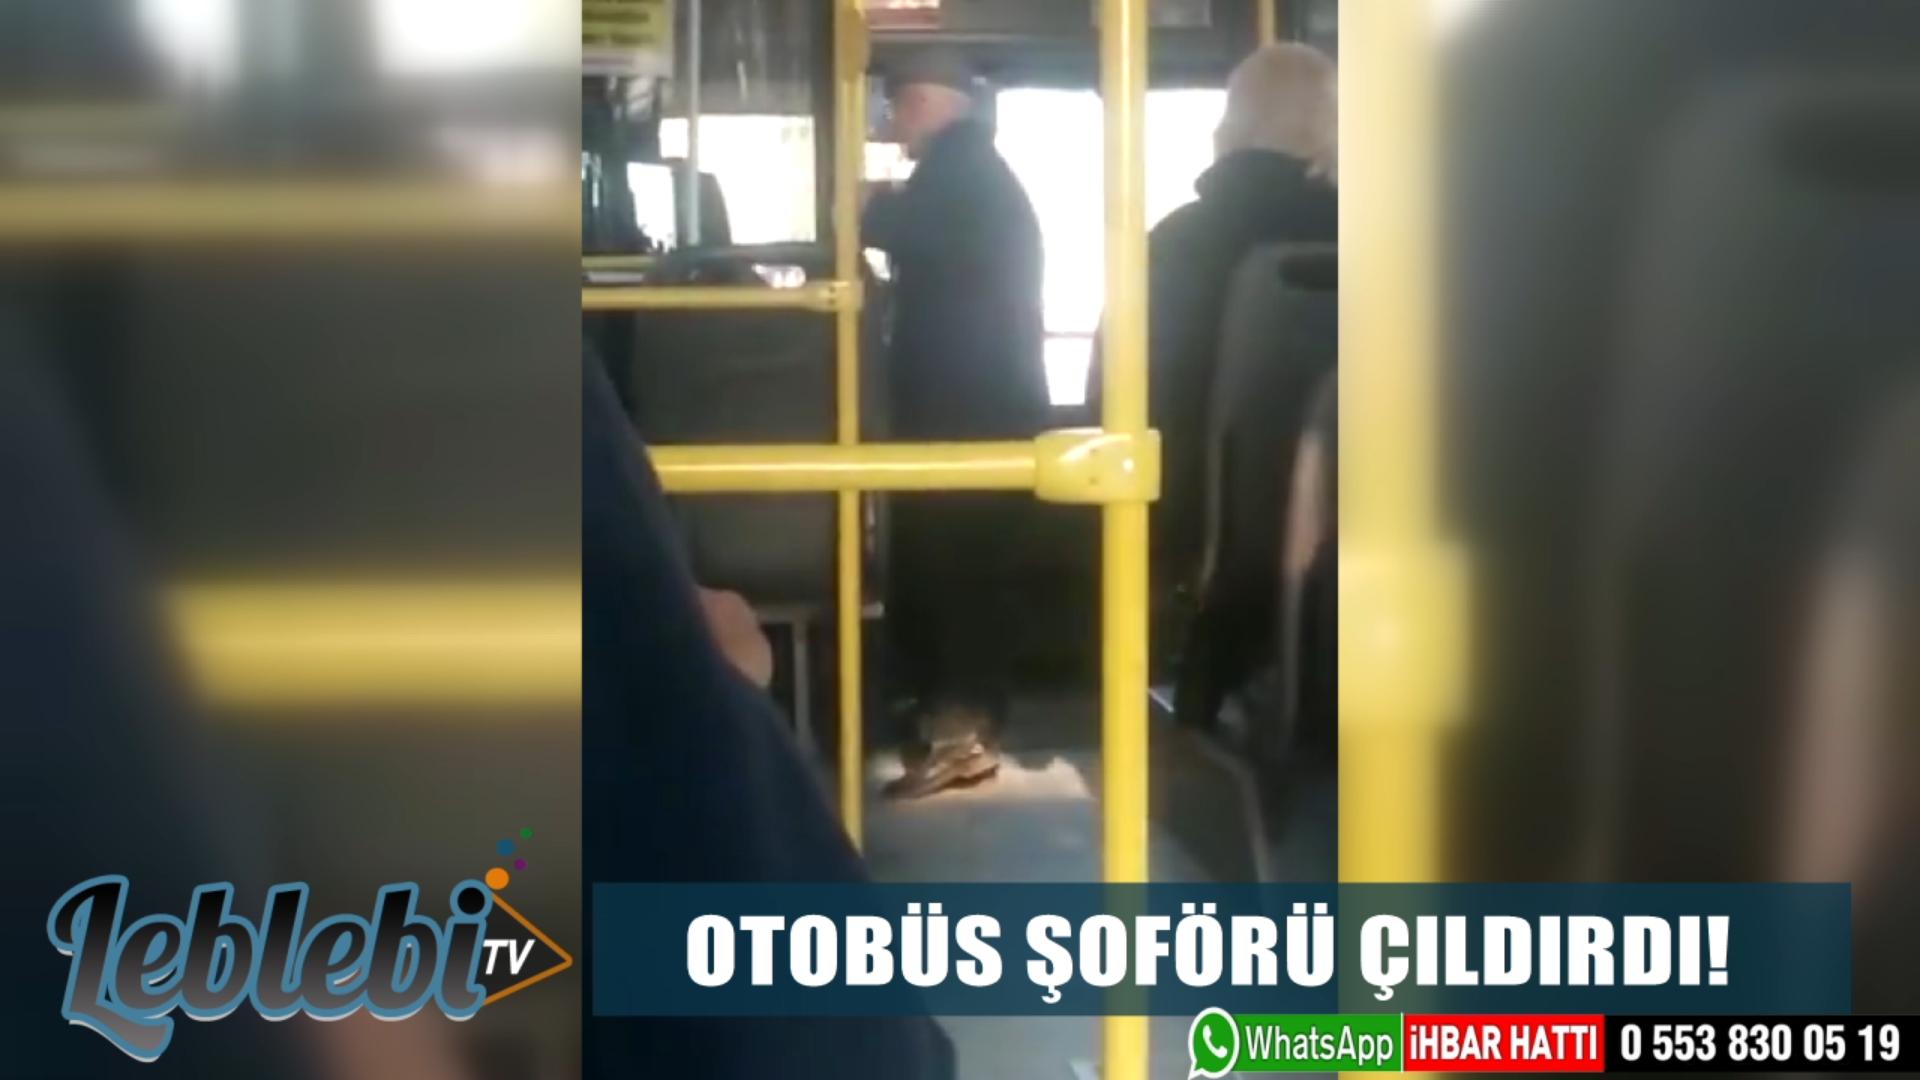 OTOBÜS ŞOFÖRÜ ÇILDIRDI!